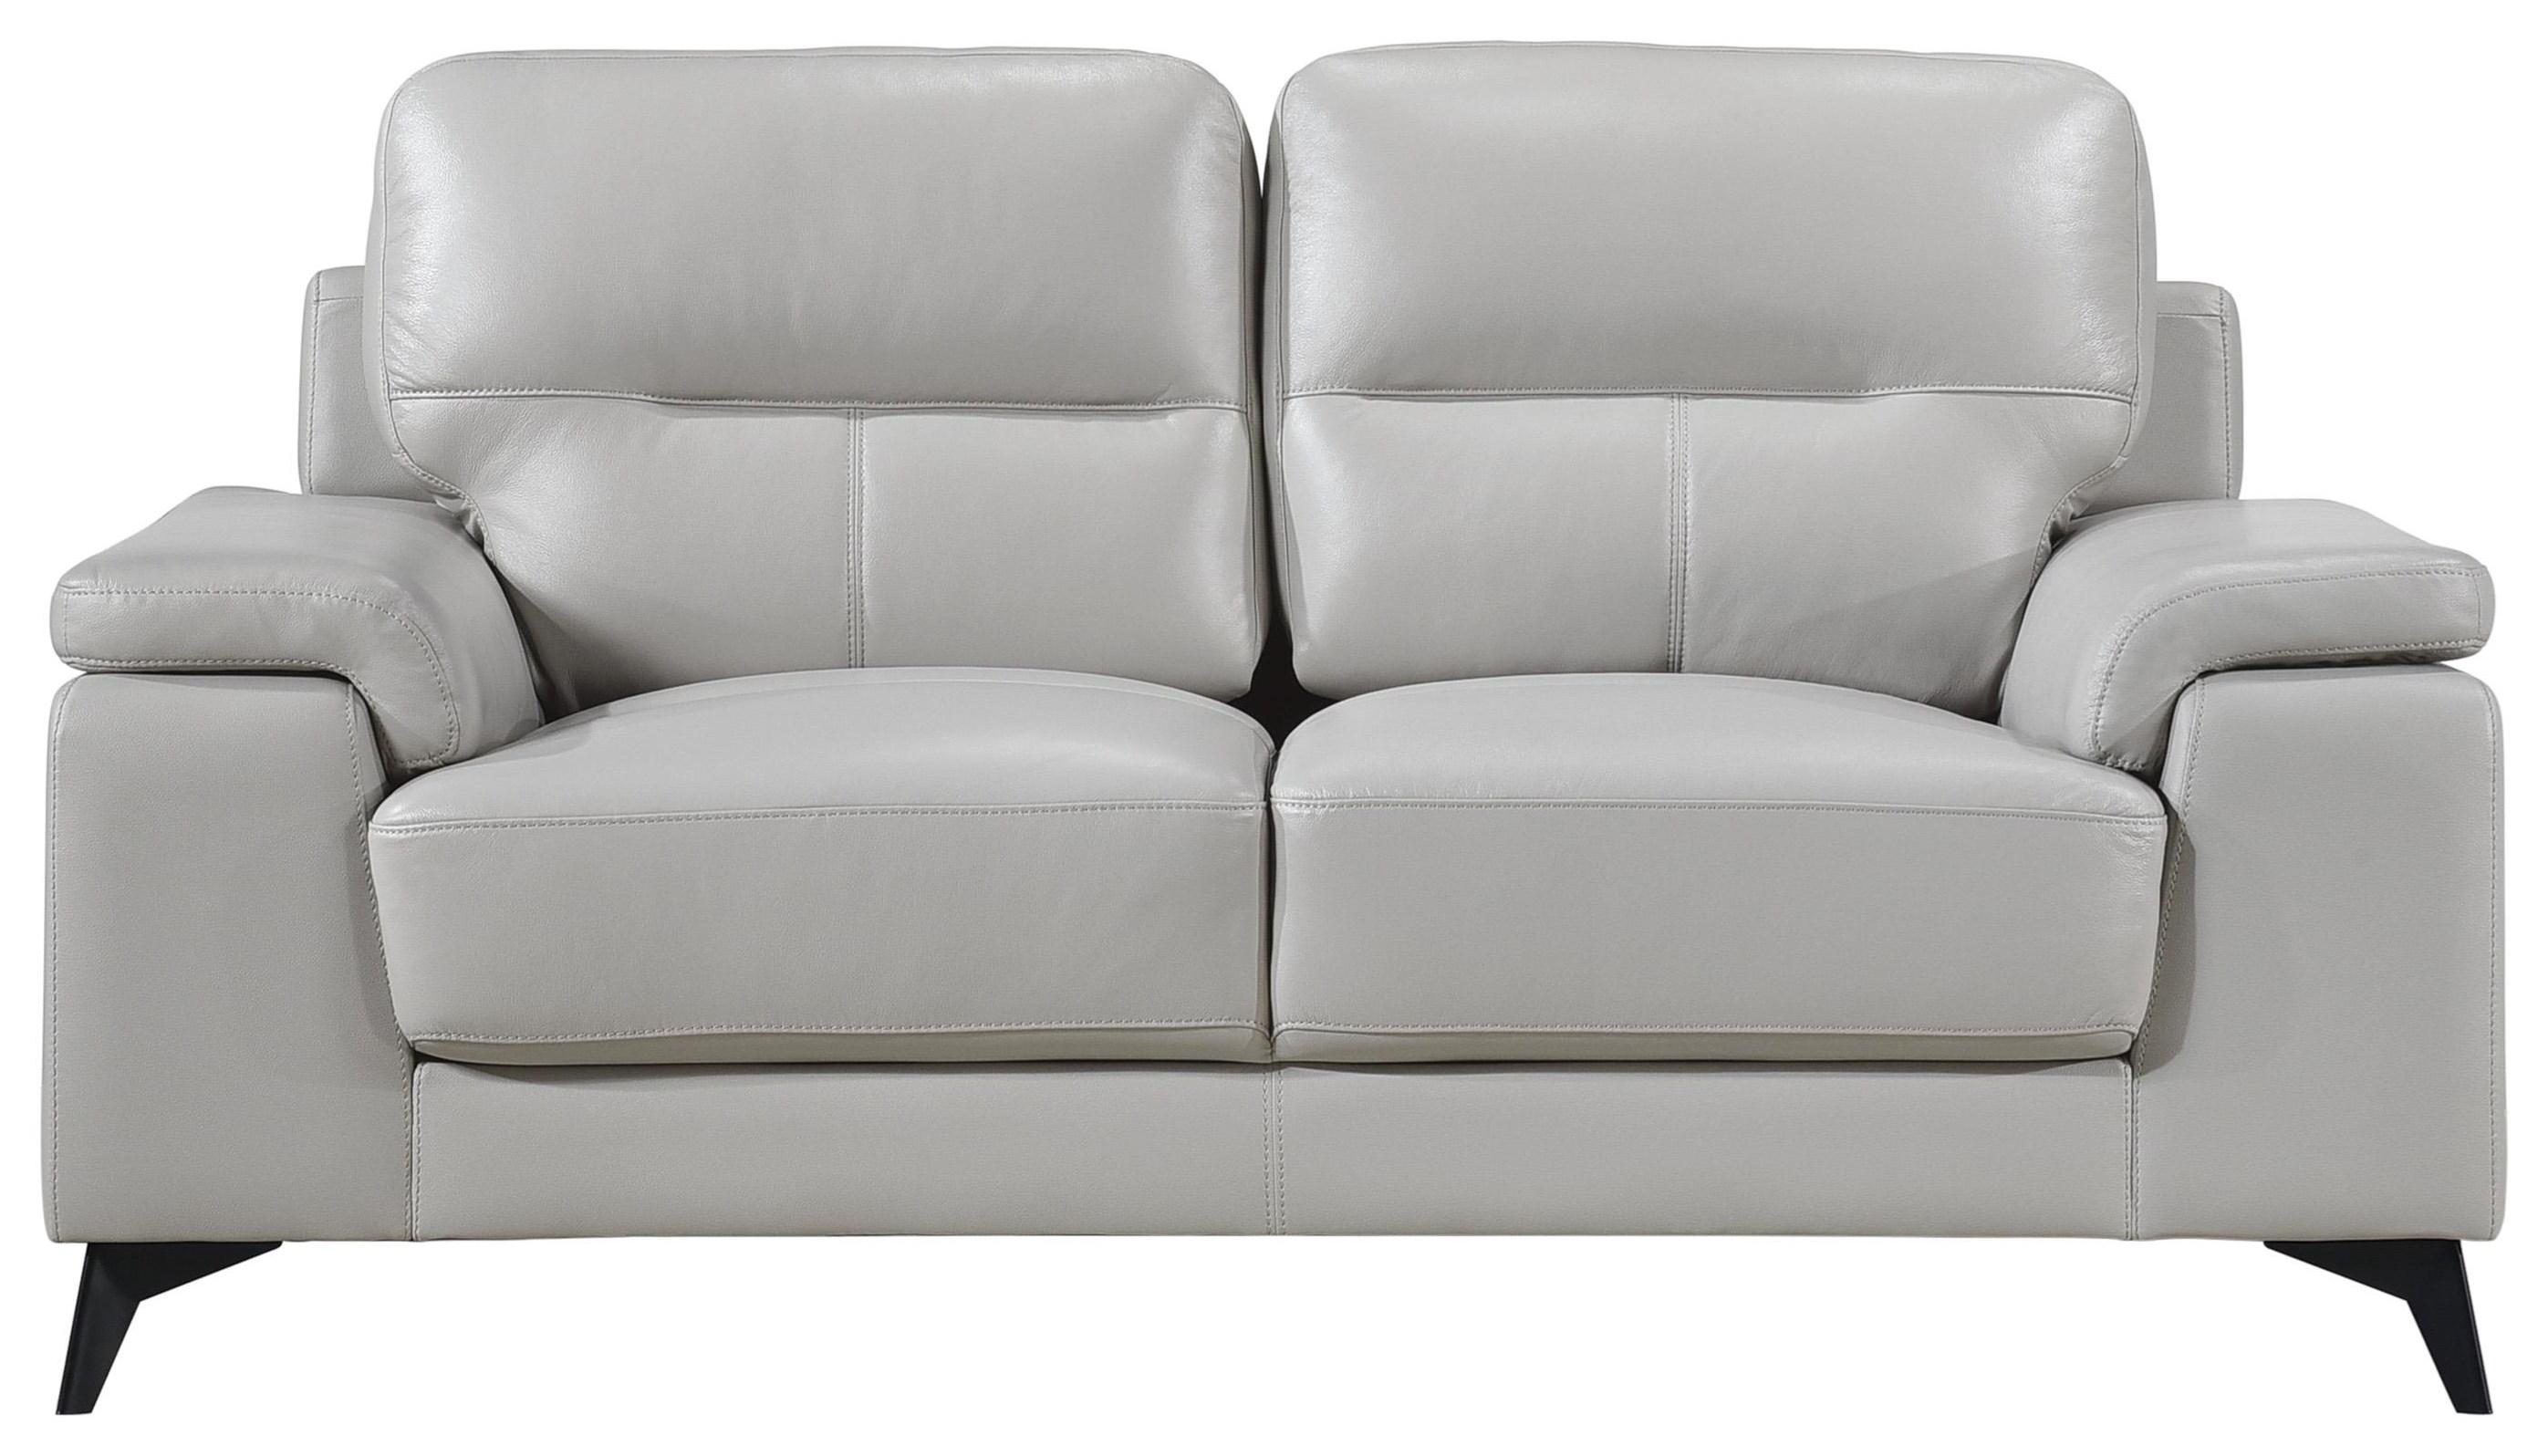 Homelegance Mischa Contemporary Leather Match Loveseat Darvin Furniture Loveseats